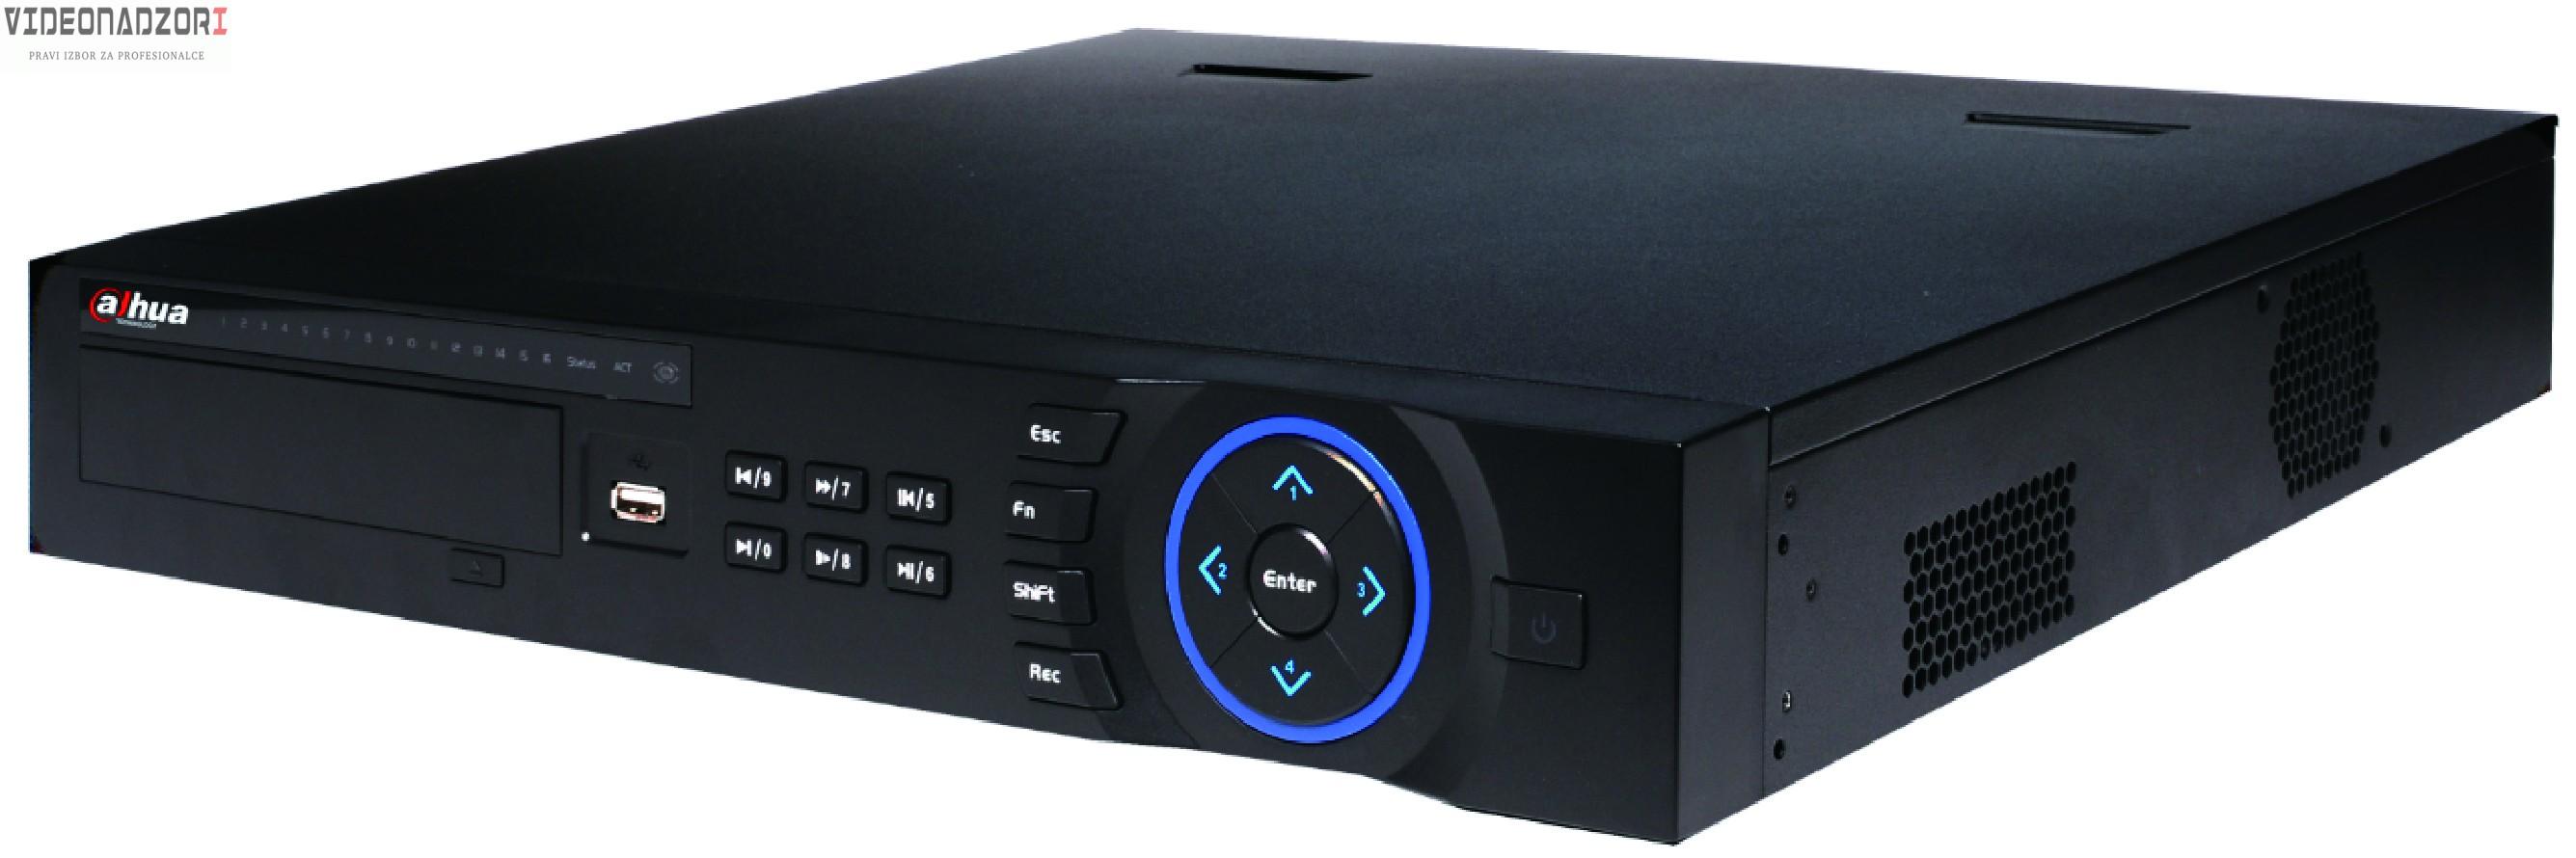 Dahua Pro HDCVI video snimac 16kanalni HCVR-7416L - 16HDCVI/ANALOG+16IP prodavac VideoNadzori Hrvatska  za 12.498,75kn